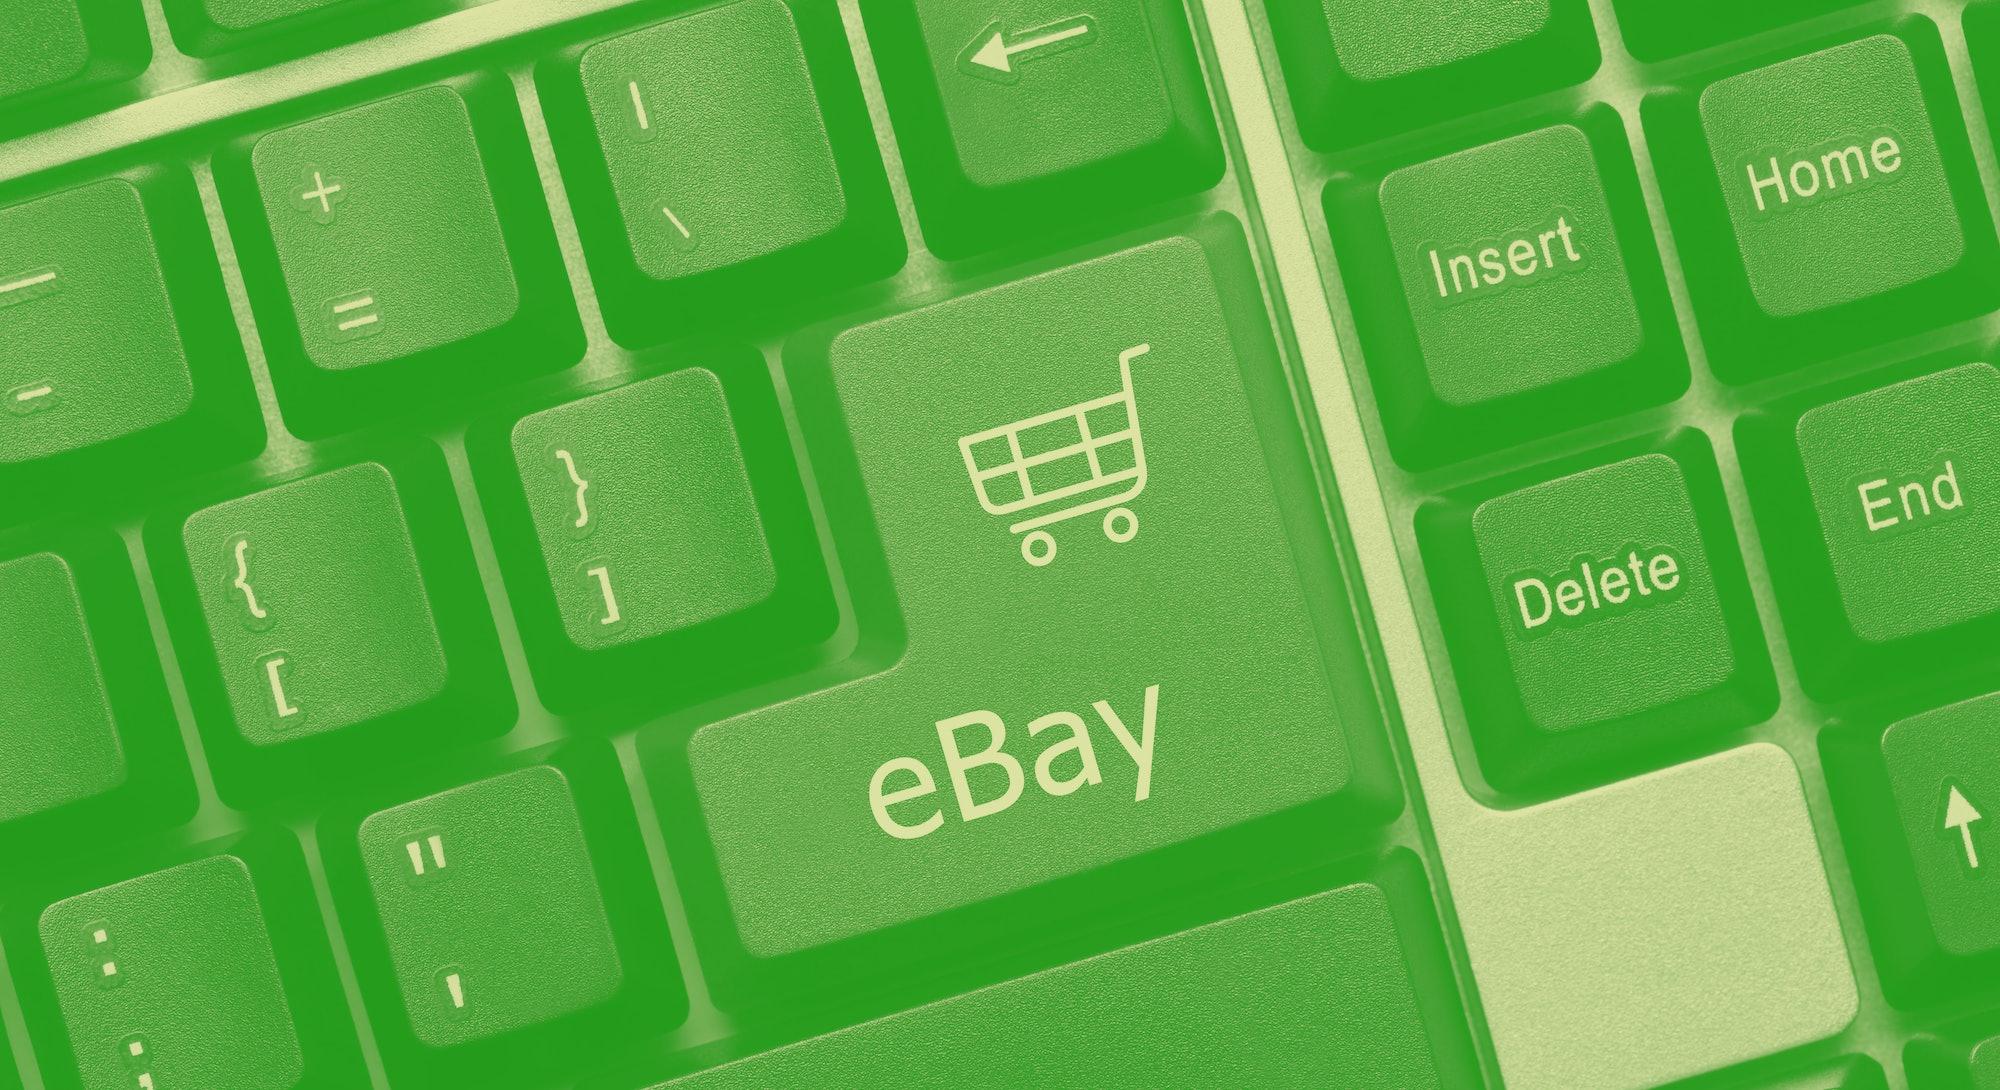 Close-up view on conceptual keyboard - eBay (green key)